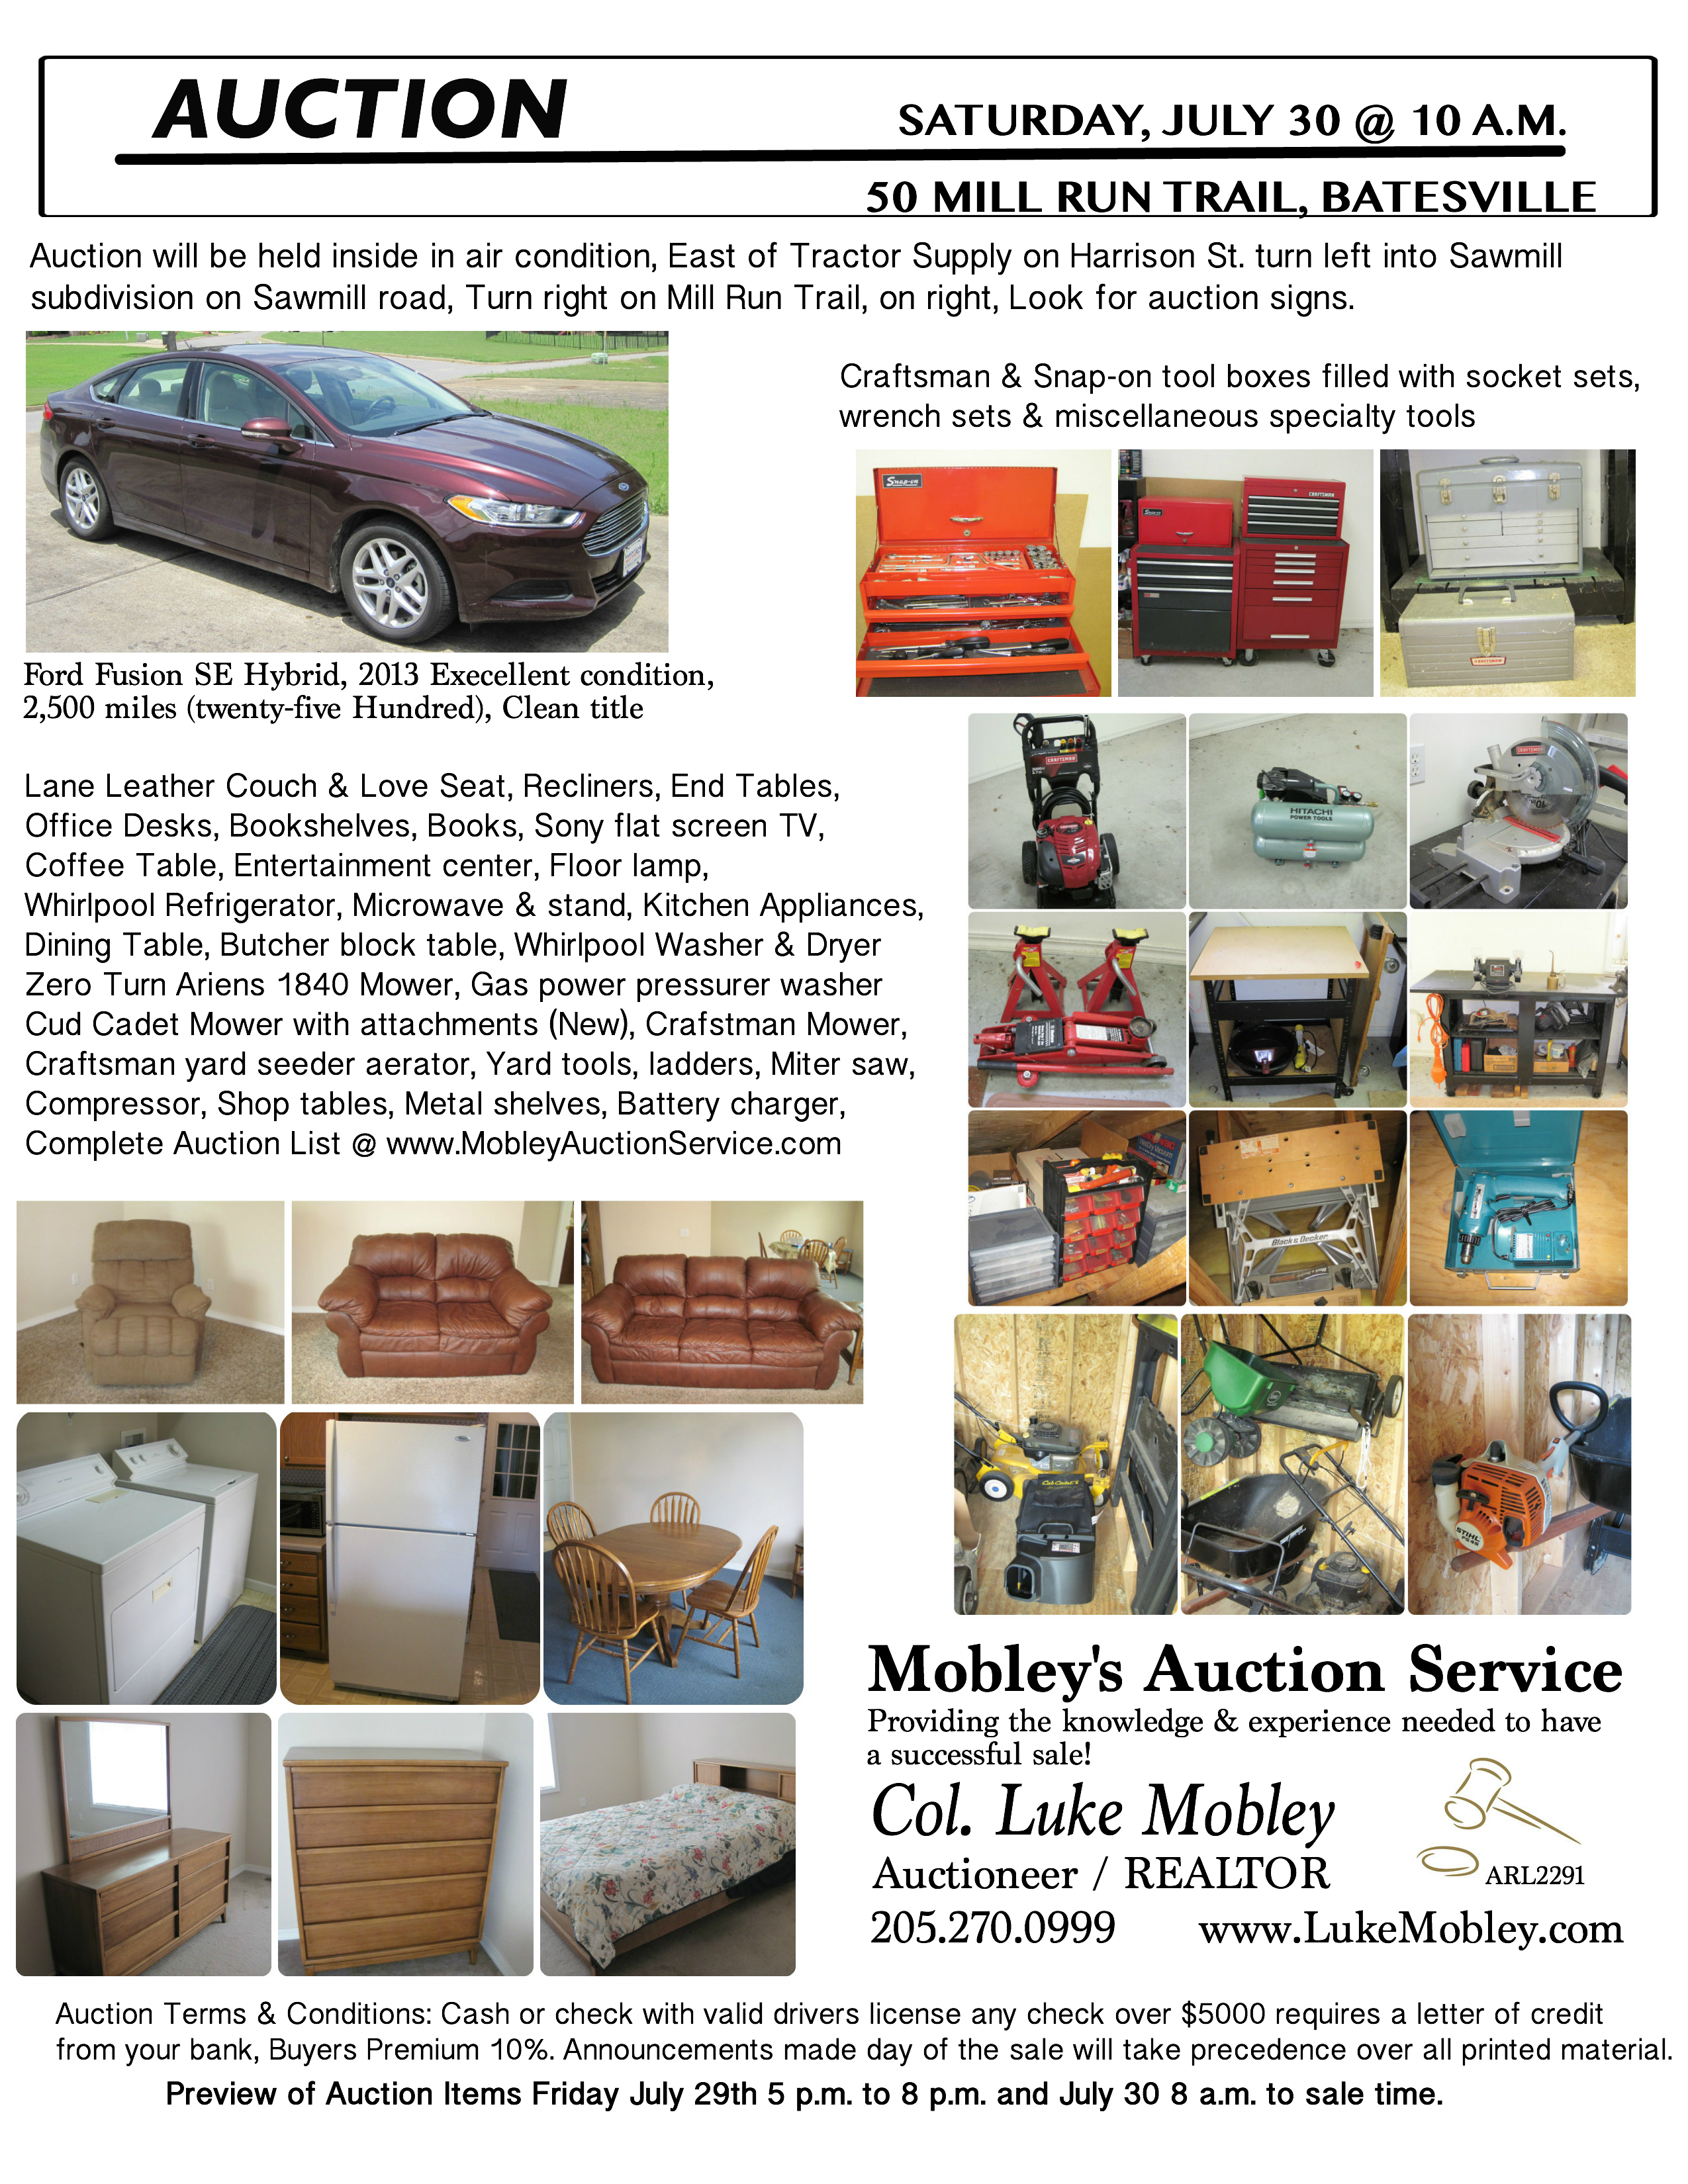 estate auctions luke mobley col colonel luke mobley kinzy flyer